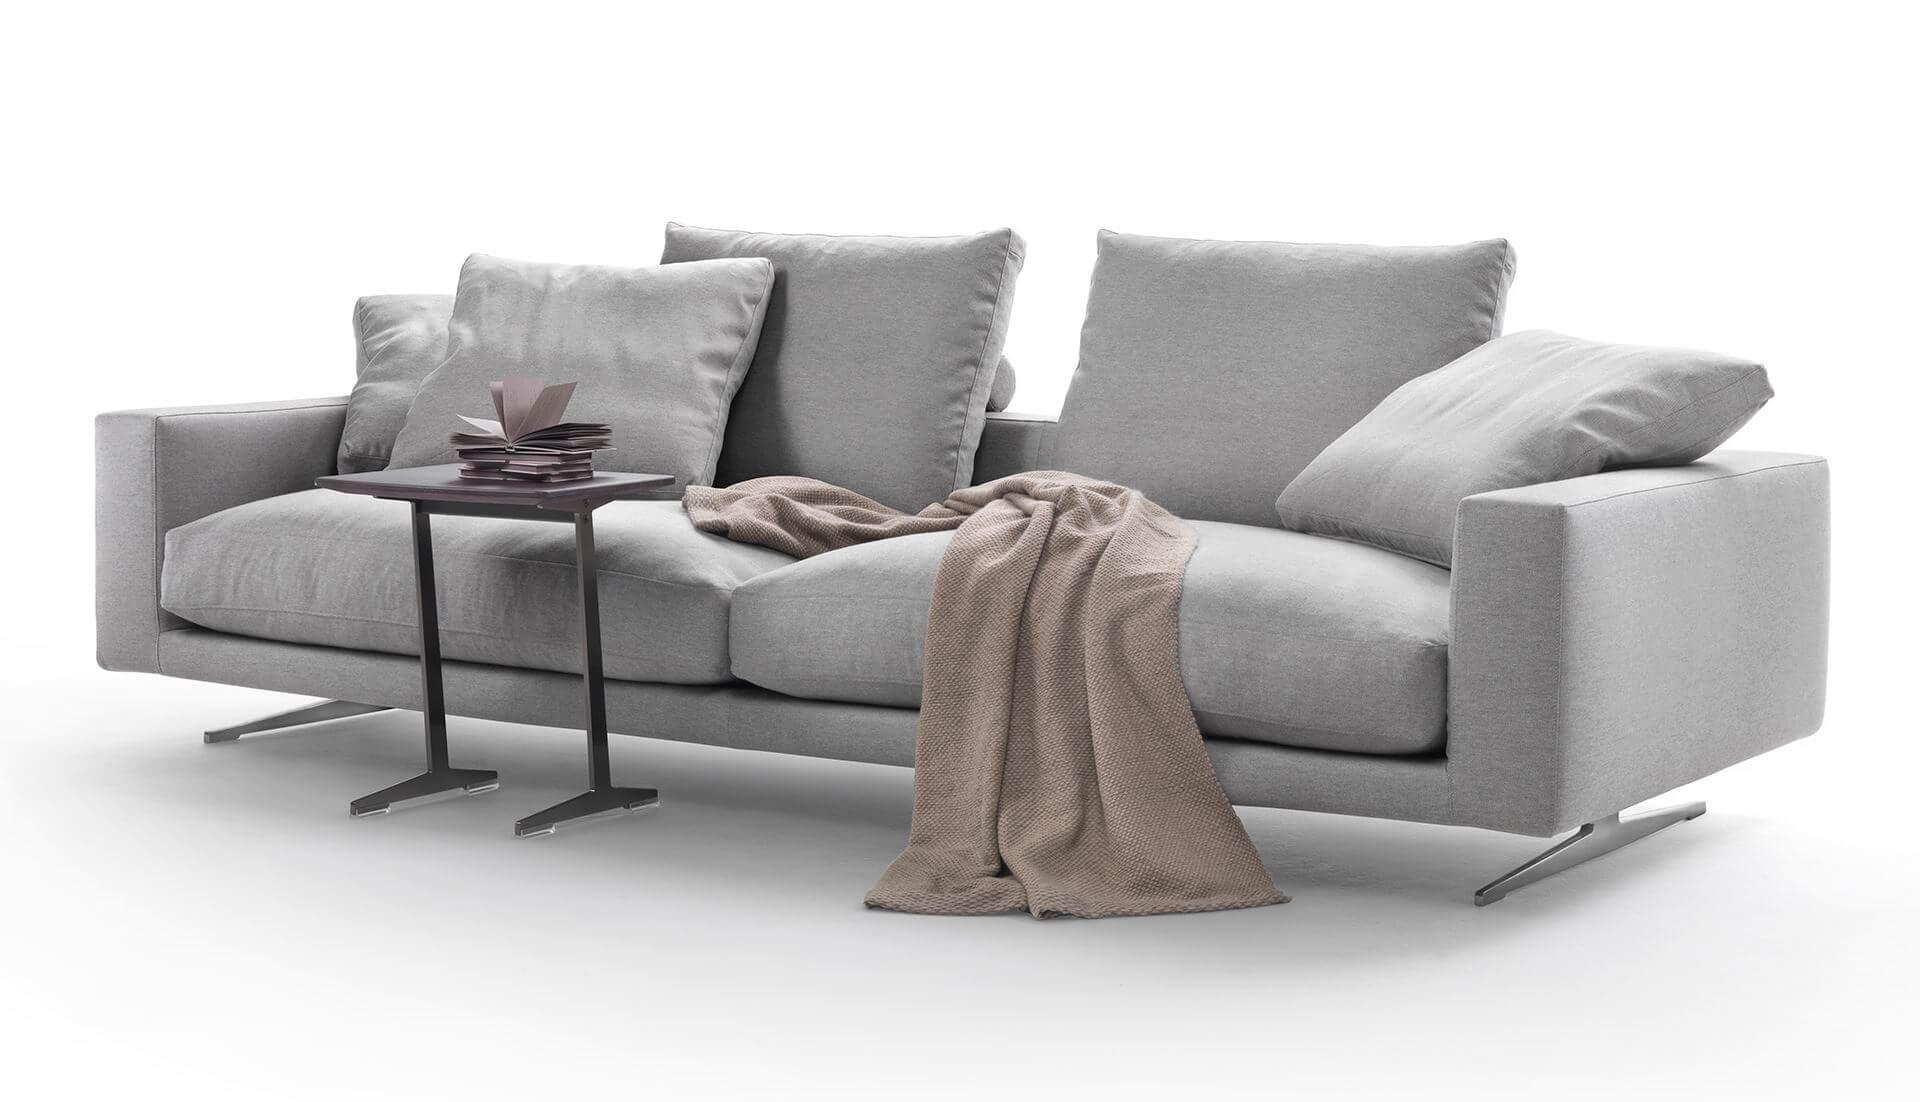 Flexform Campiello Modular Sofa – Dream Design Interiors Ltd Regarding Dream Navy 3 Piece Modular Sofas (View 5 of 15)